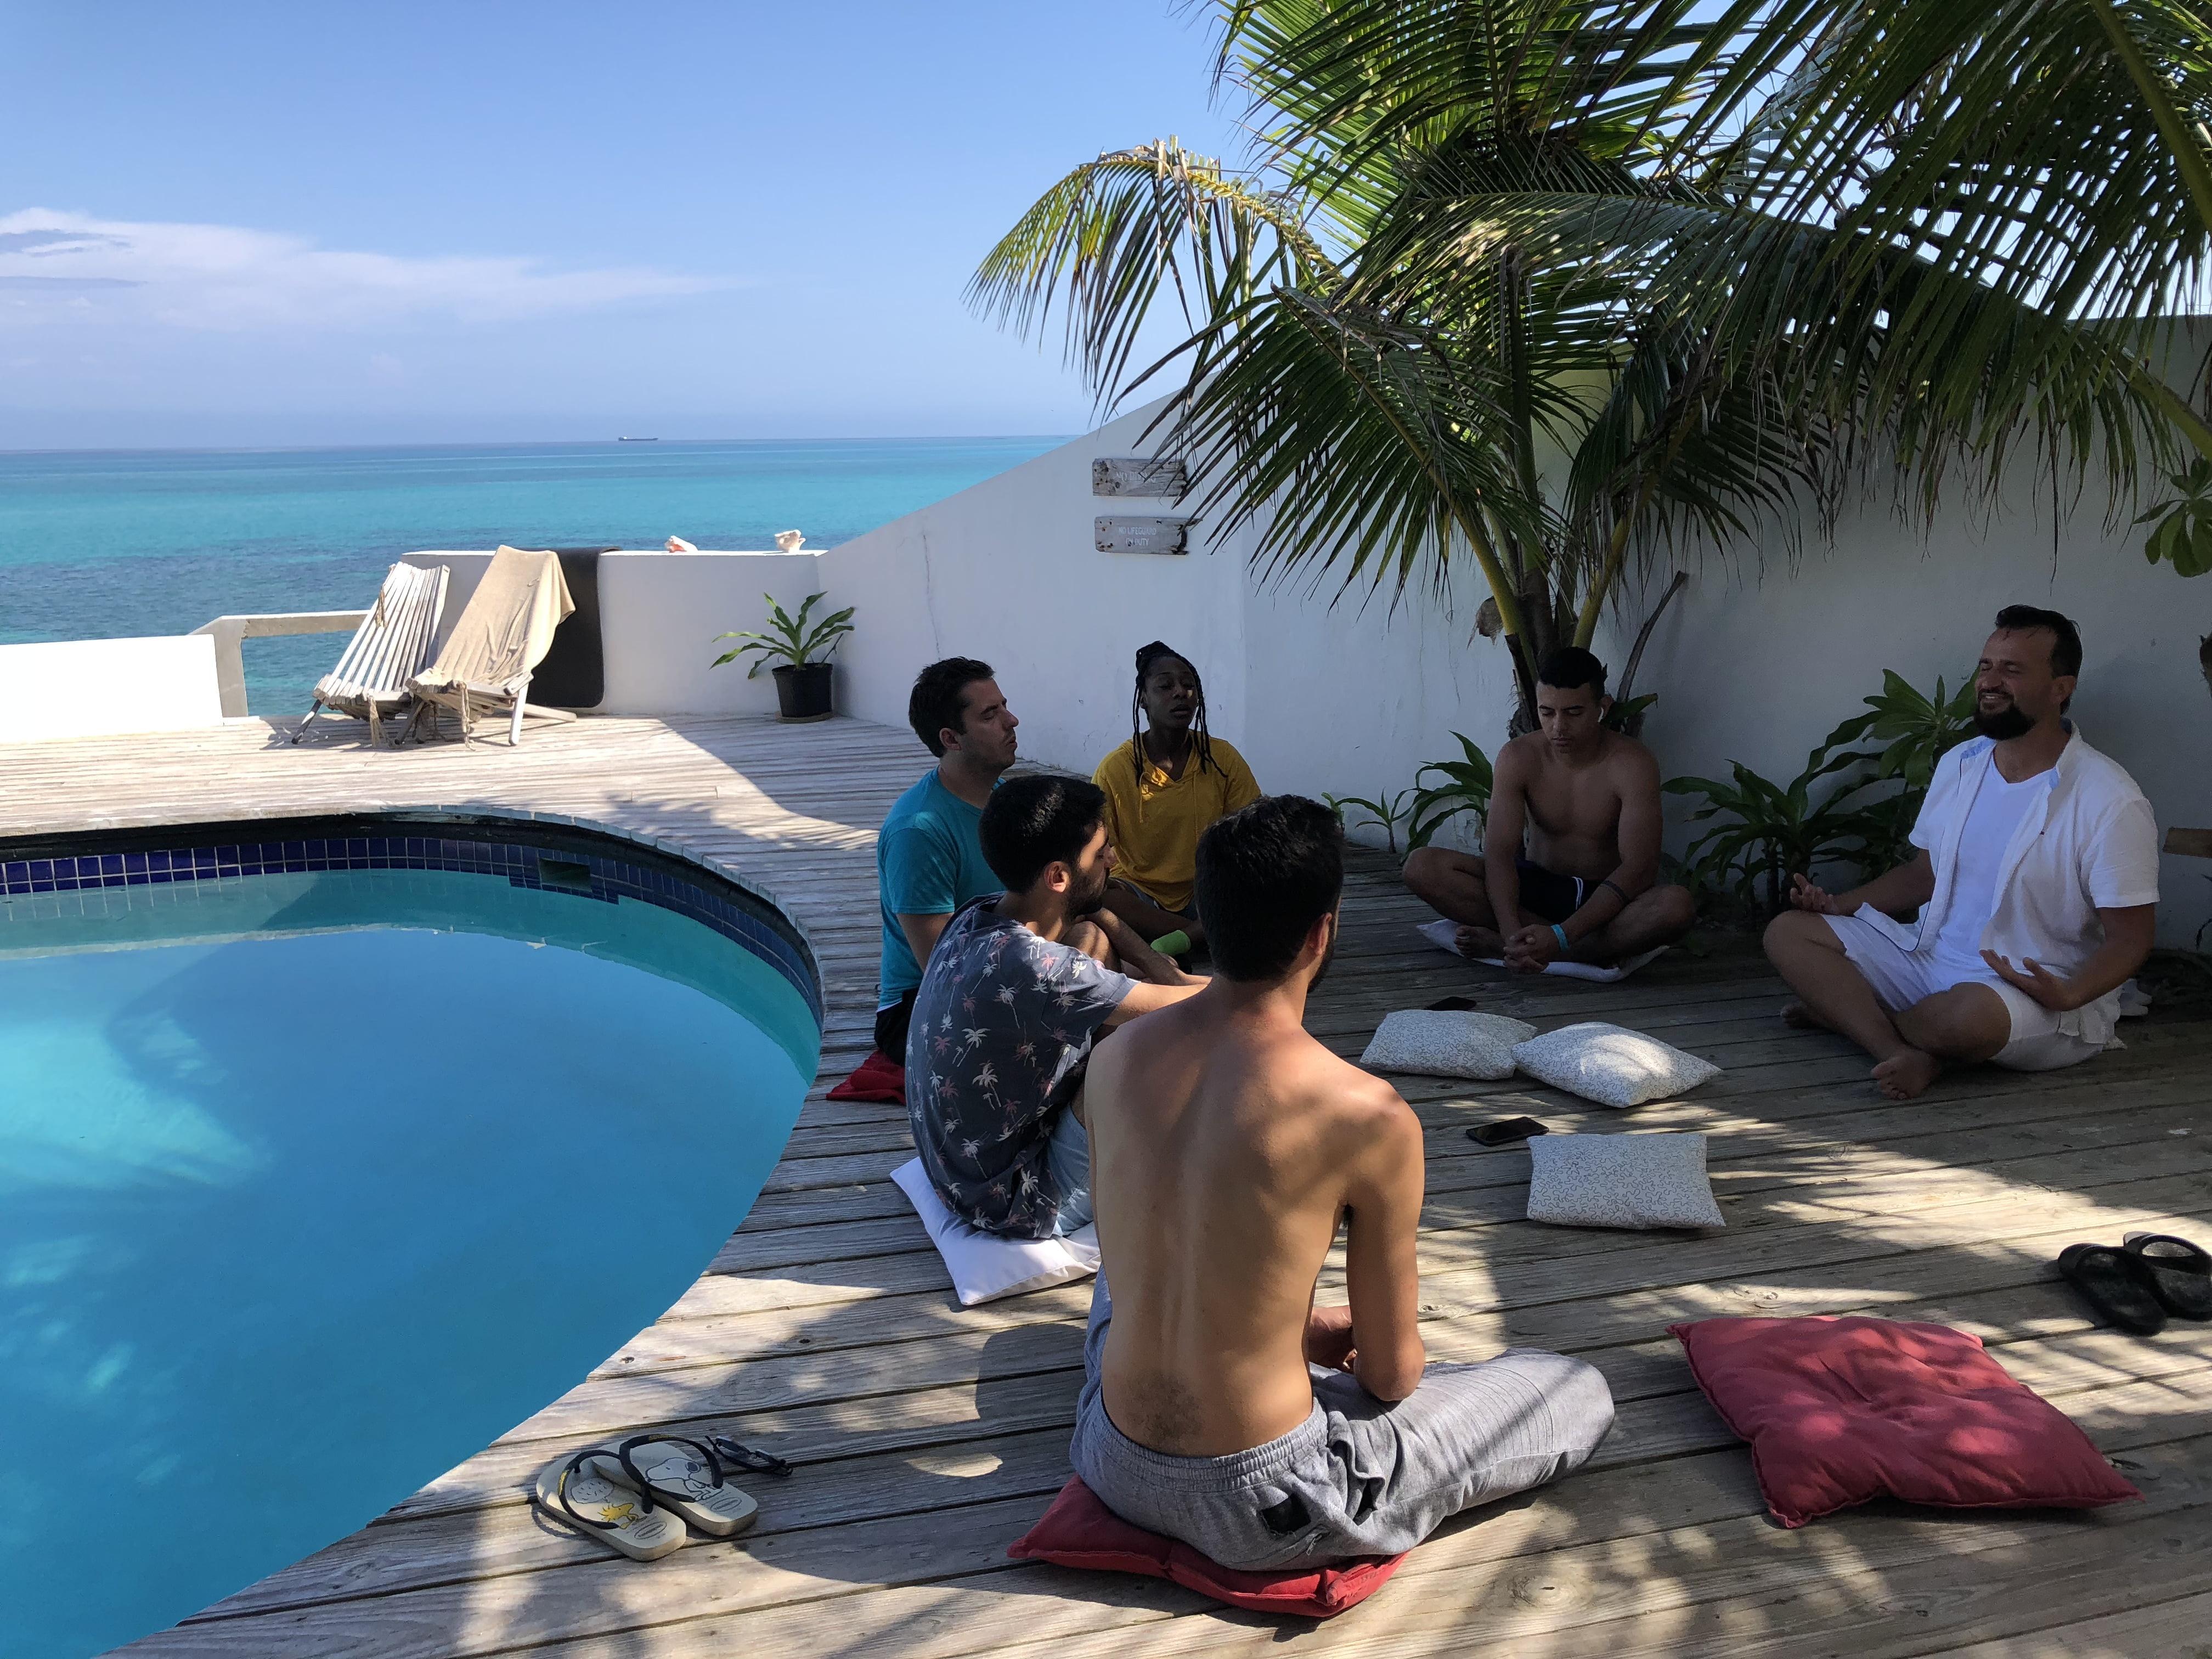 Beach Front Retreat in the Bahamas